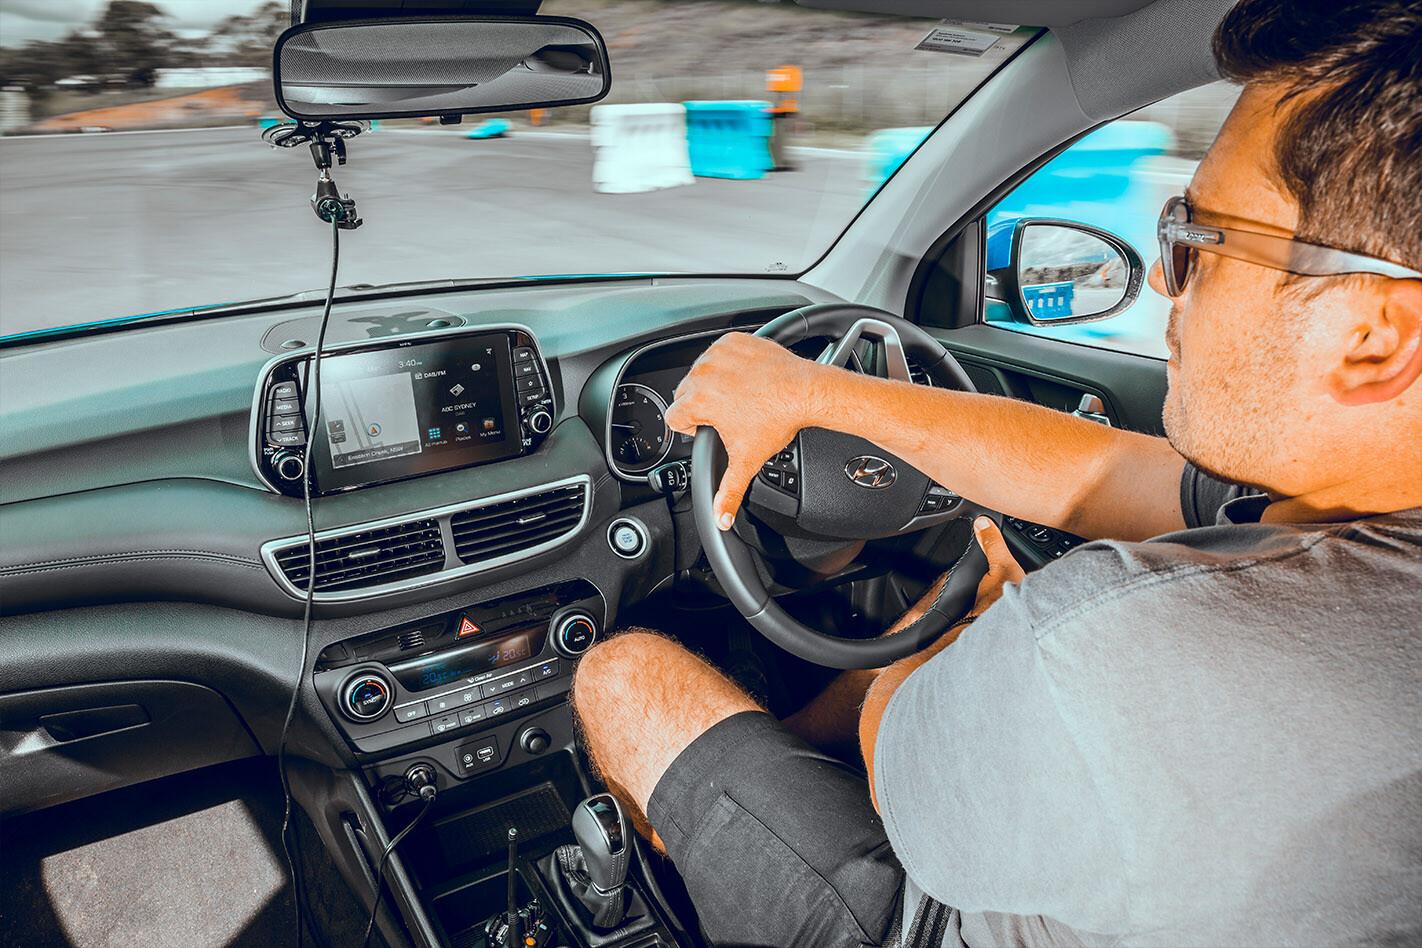 2020 Wheels Tyre Test Driving Jpg